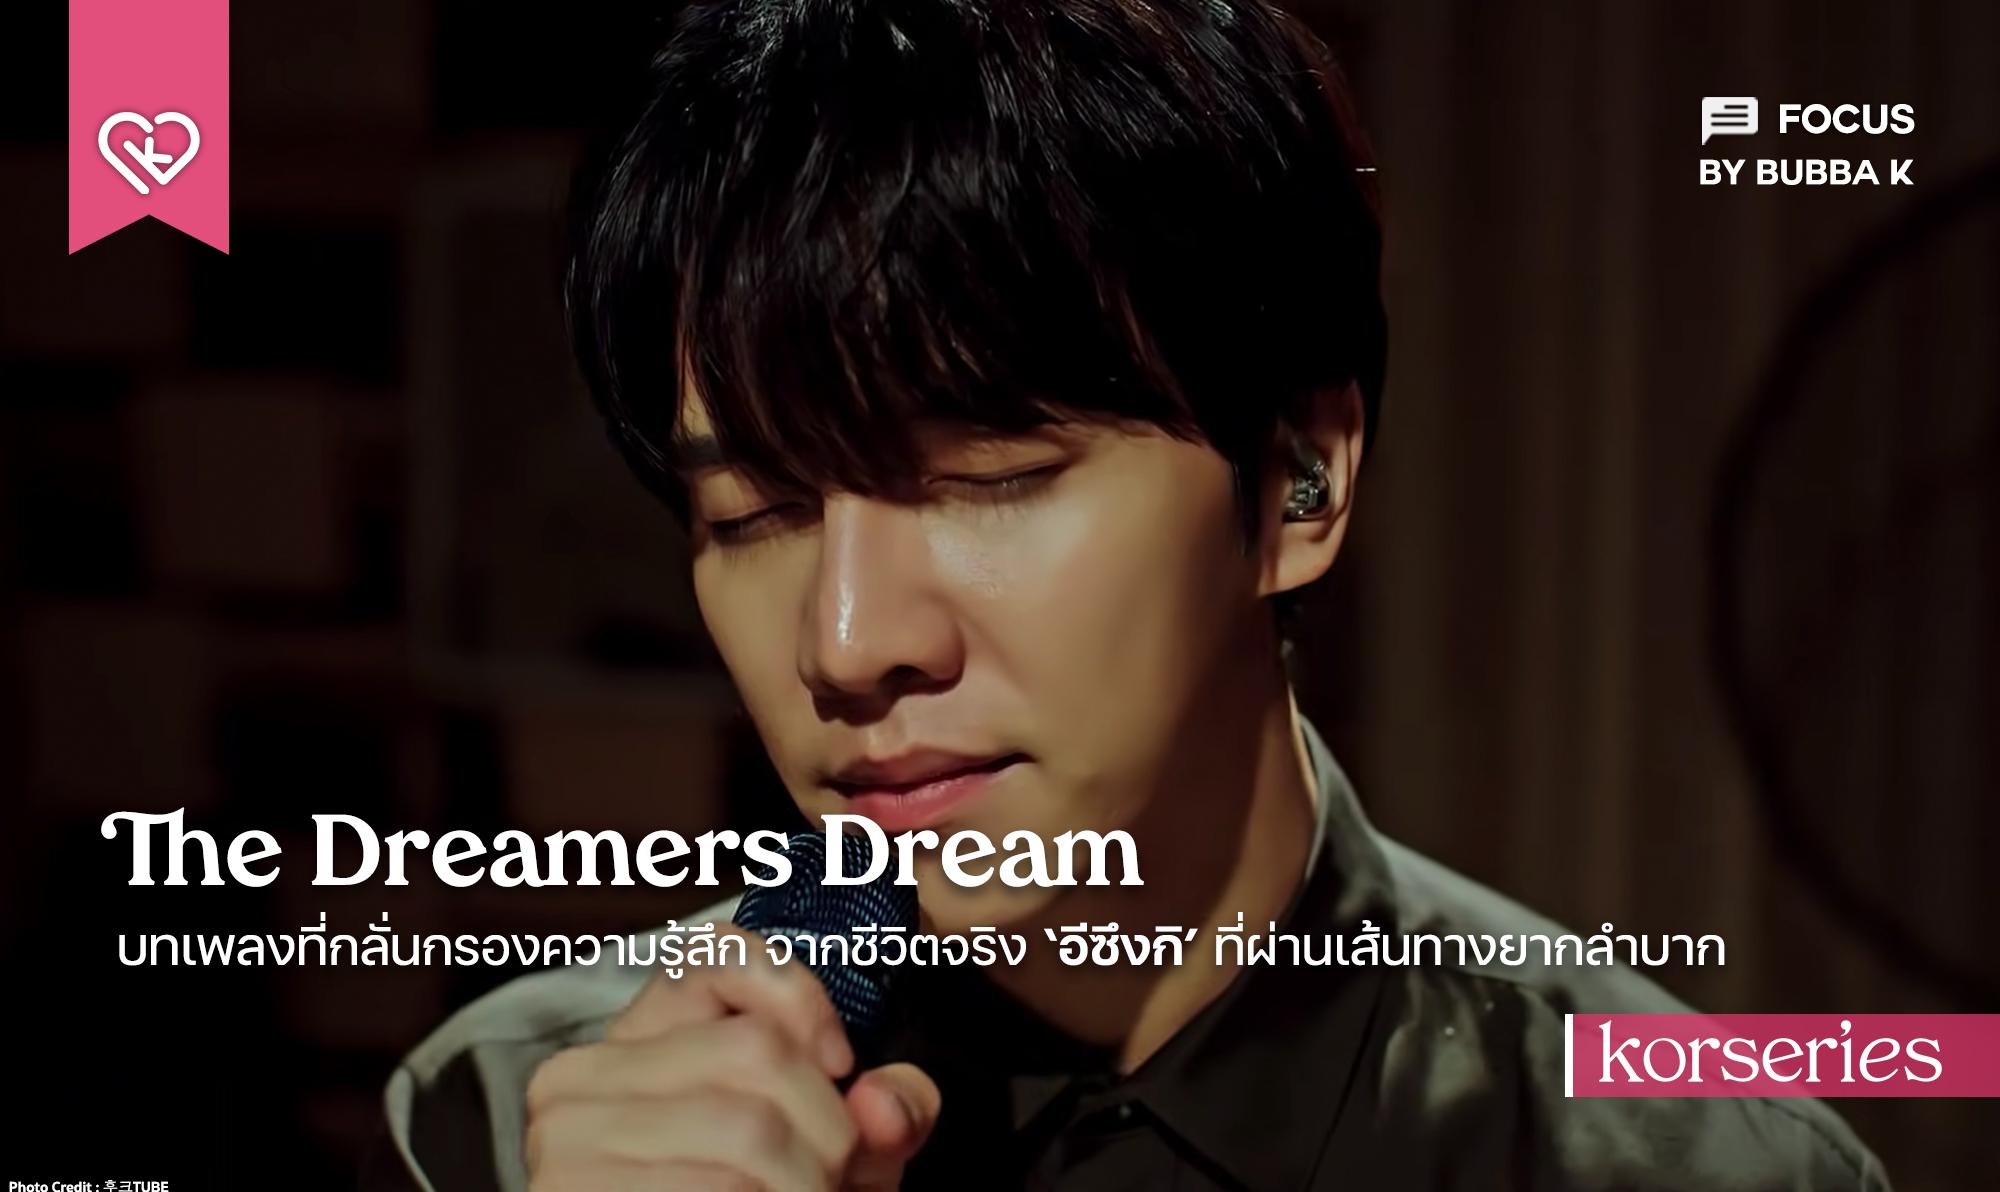 The Dreamers Dream : บทเพลงที่กลั่นกรองความรู้สึก จากชีวิตจริง 'อีซึงกิ' ที่ผ่านเส้นทางยากลำบาก